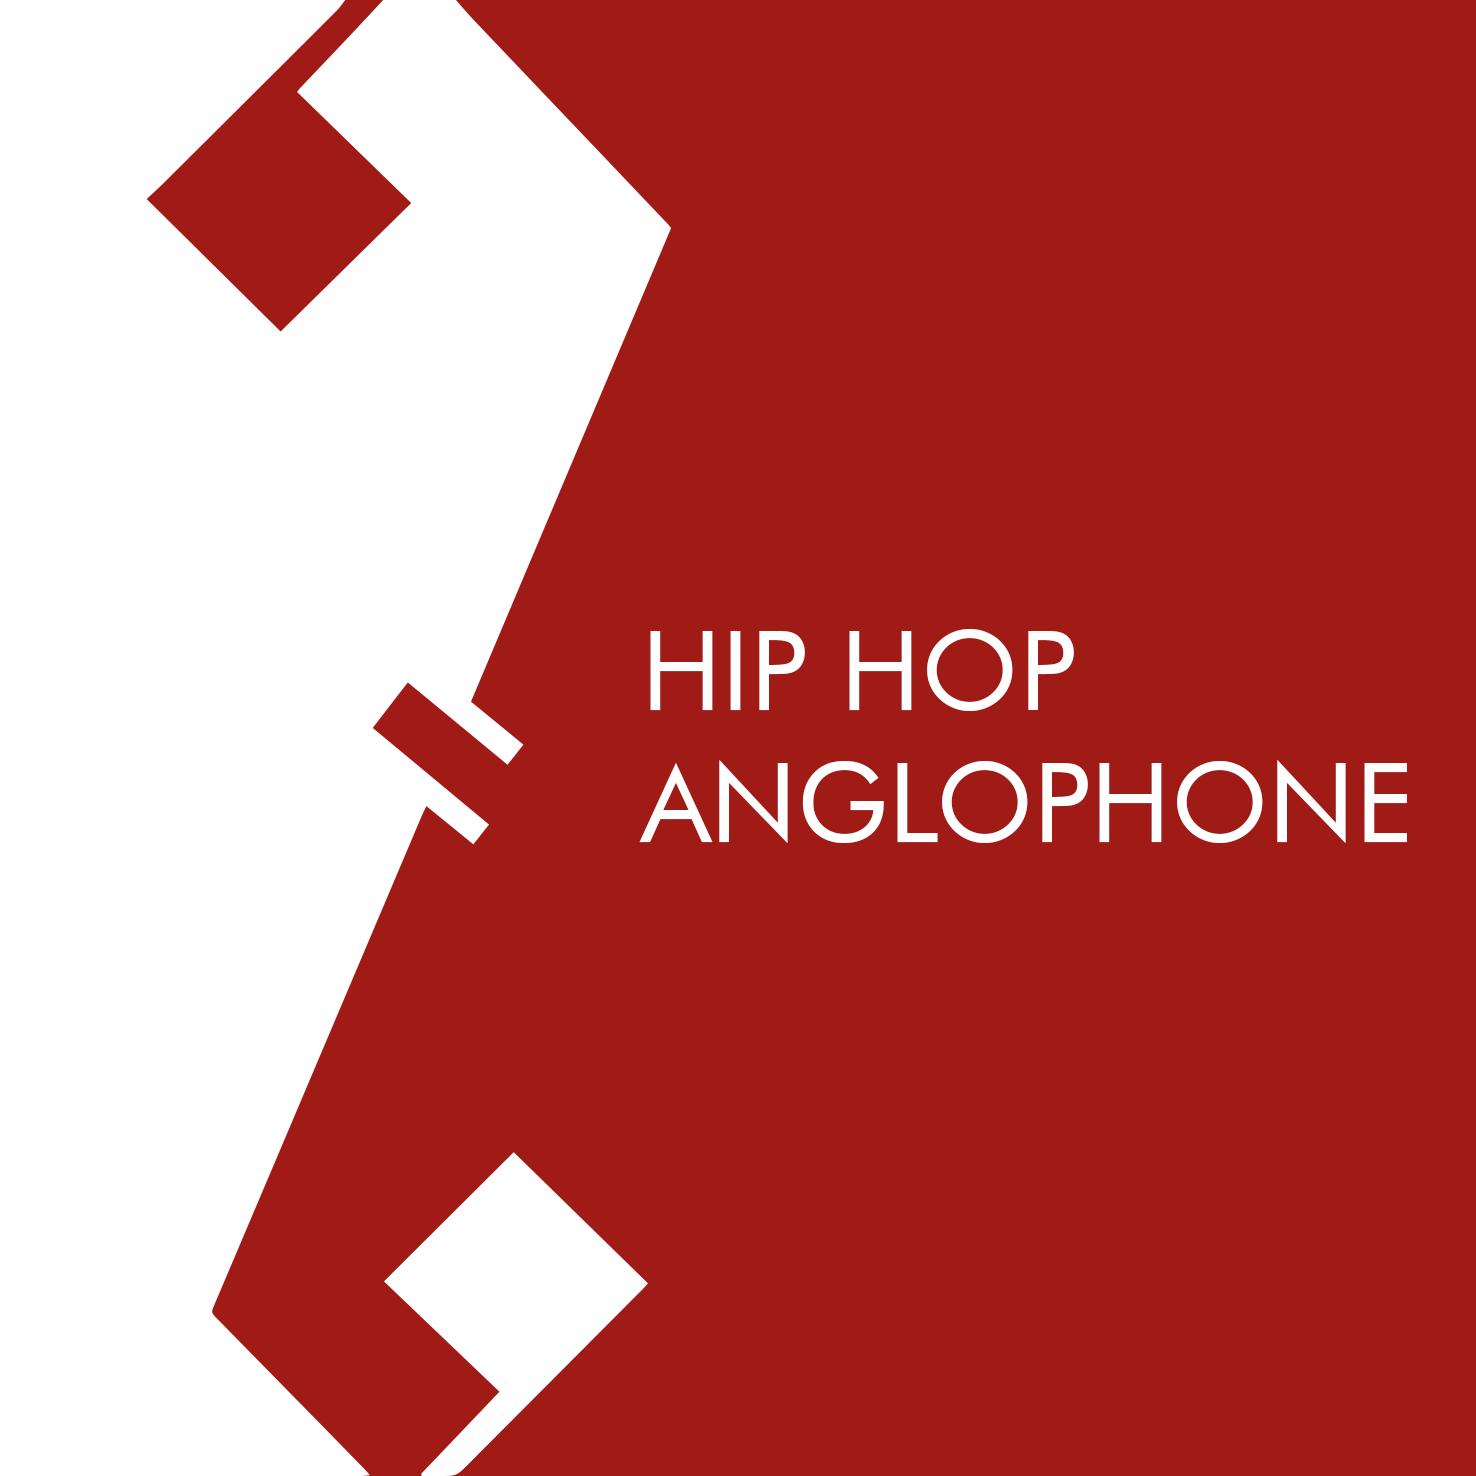 HIP HOP ANGLOPHONE